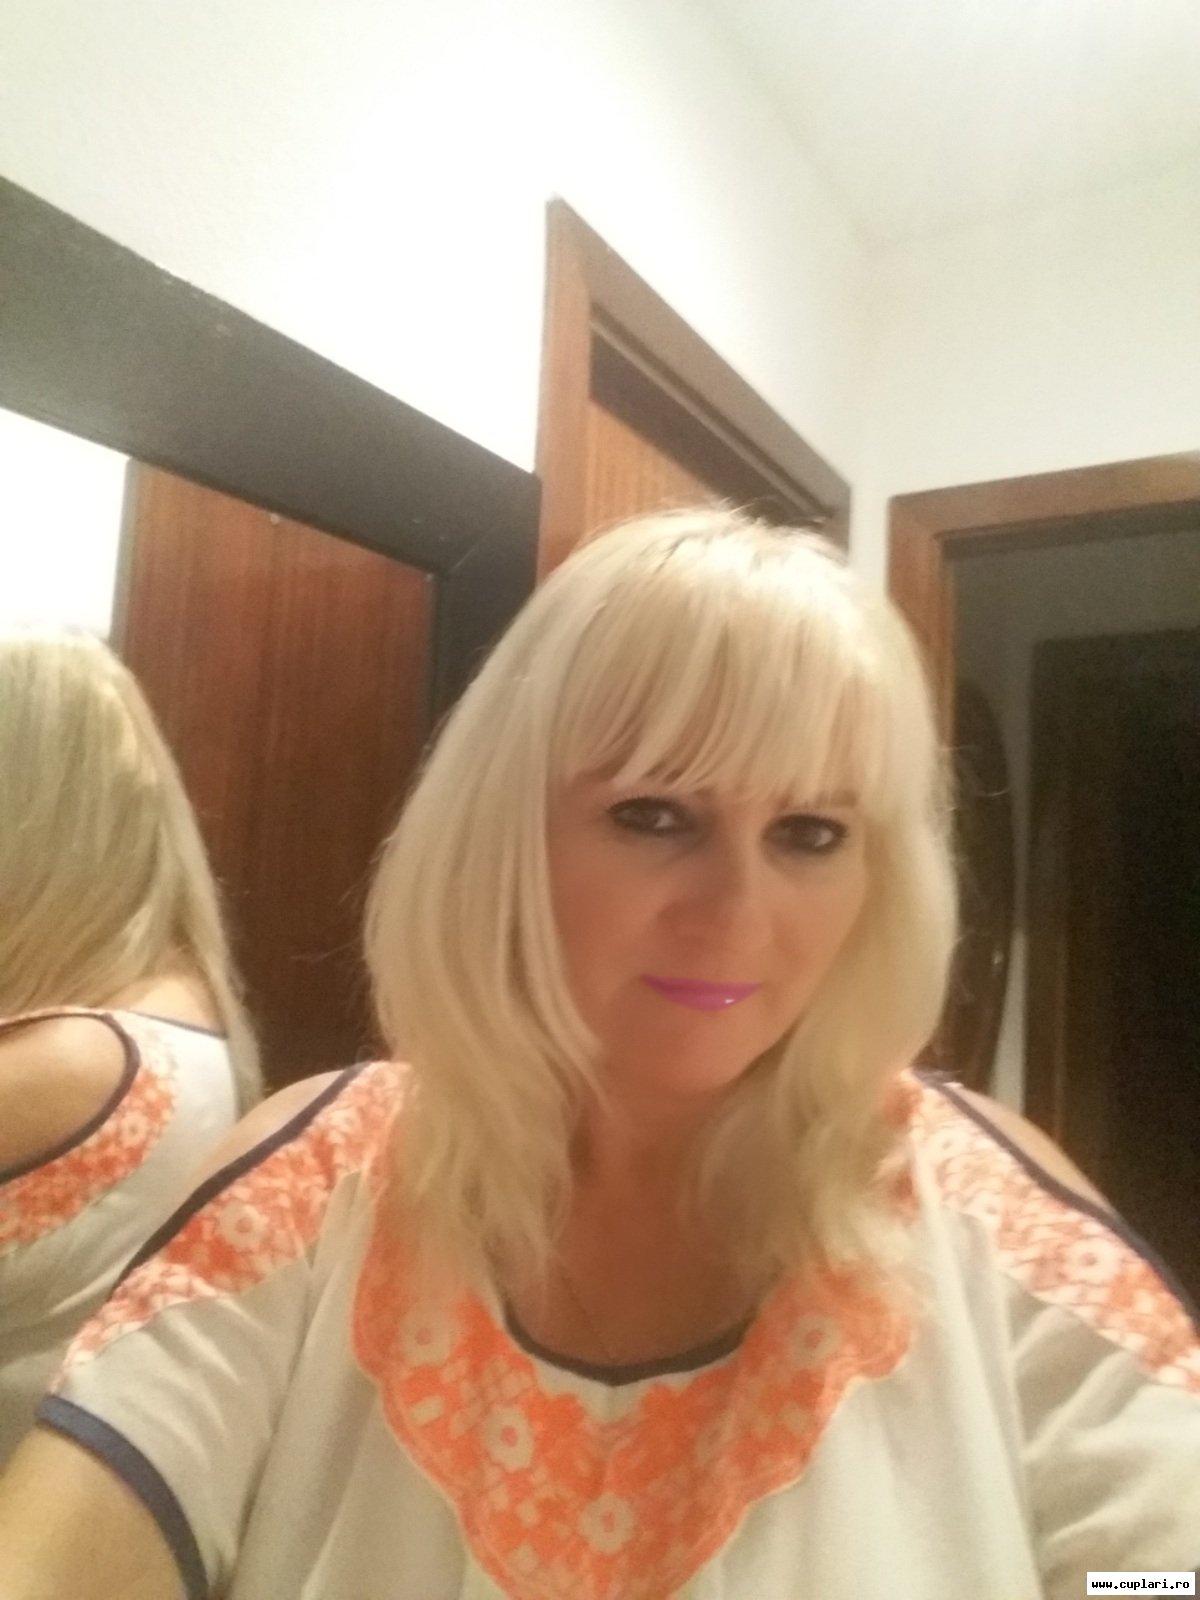 Caut baiat pentru o noapte in timișoara. Caut Amant Timisoara - maroseyka.com